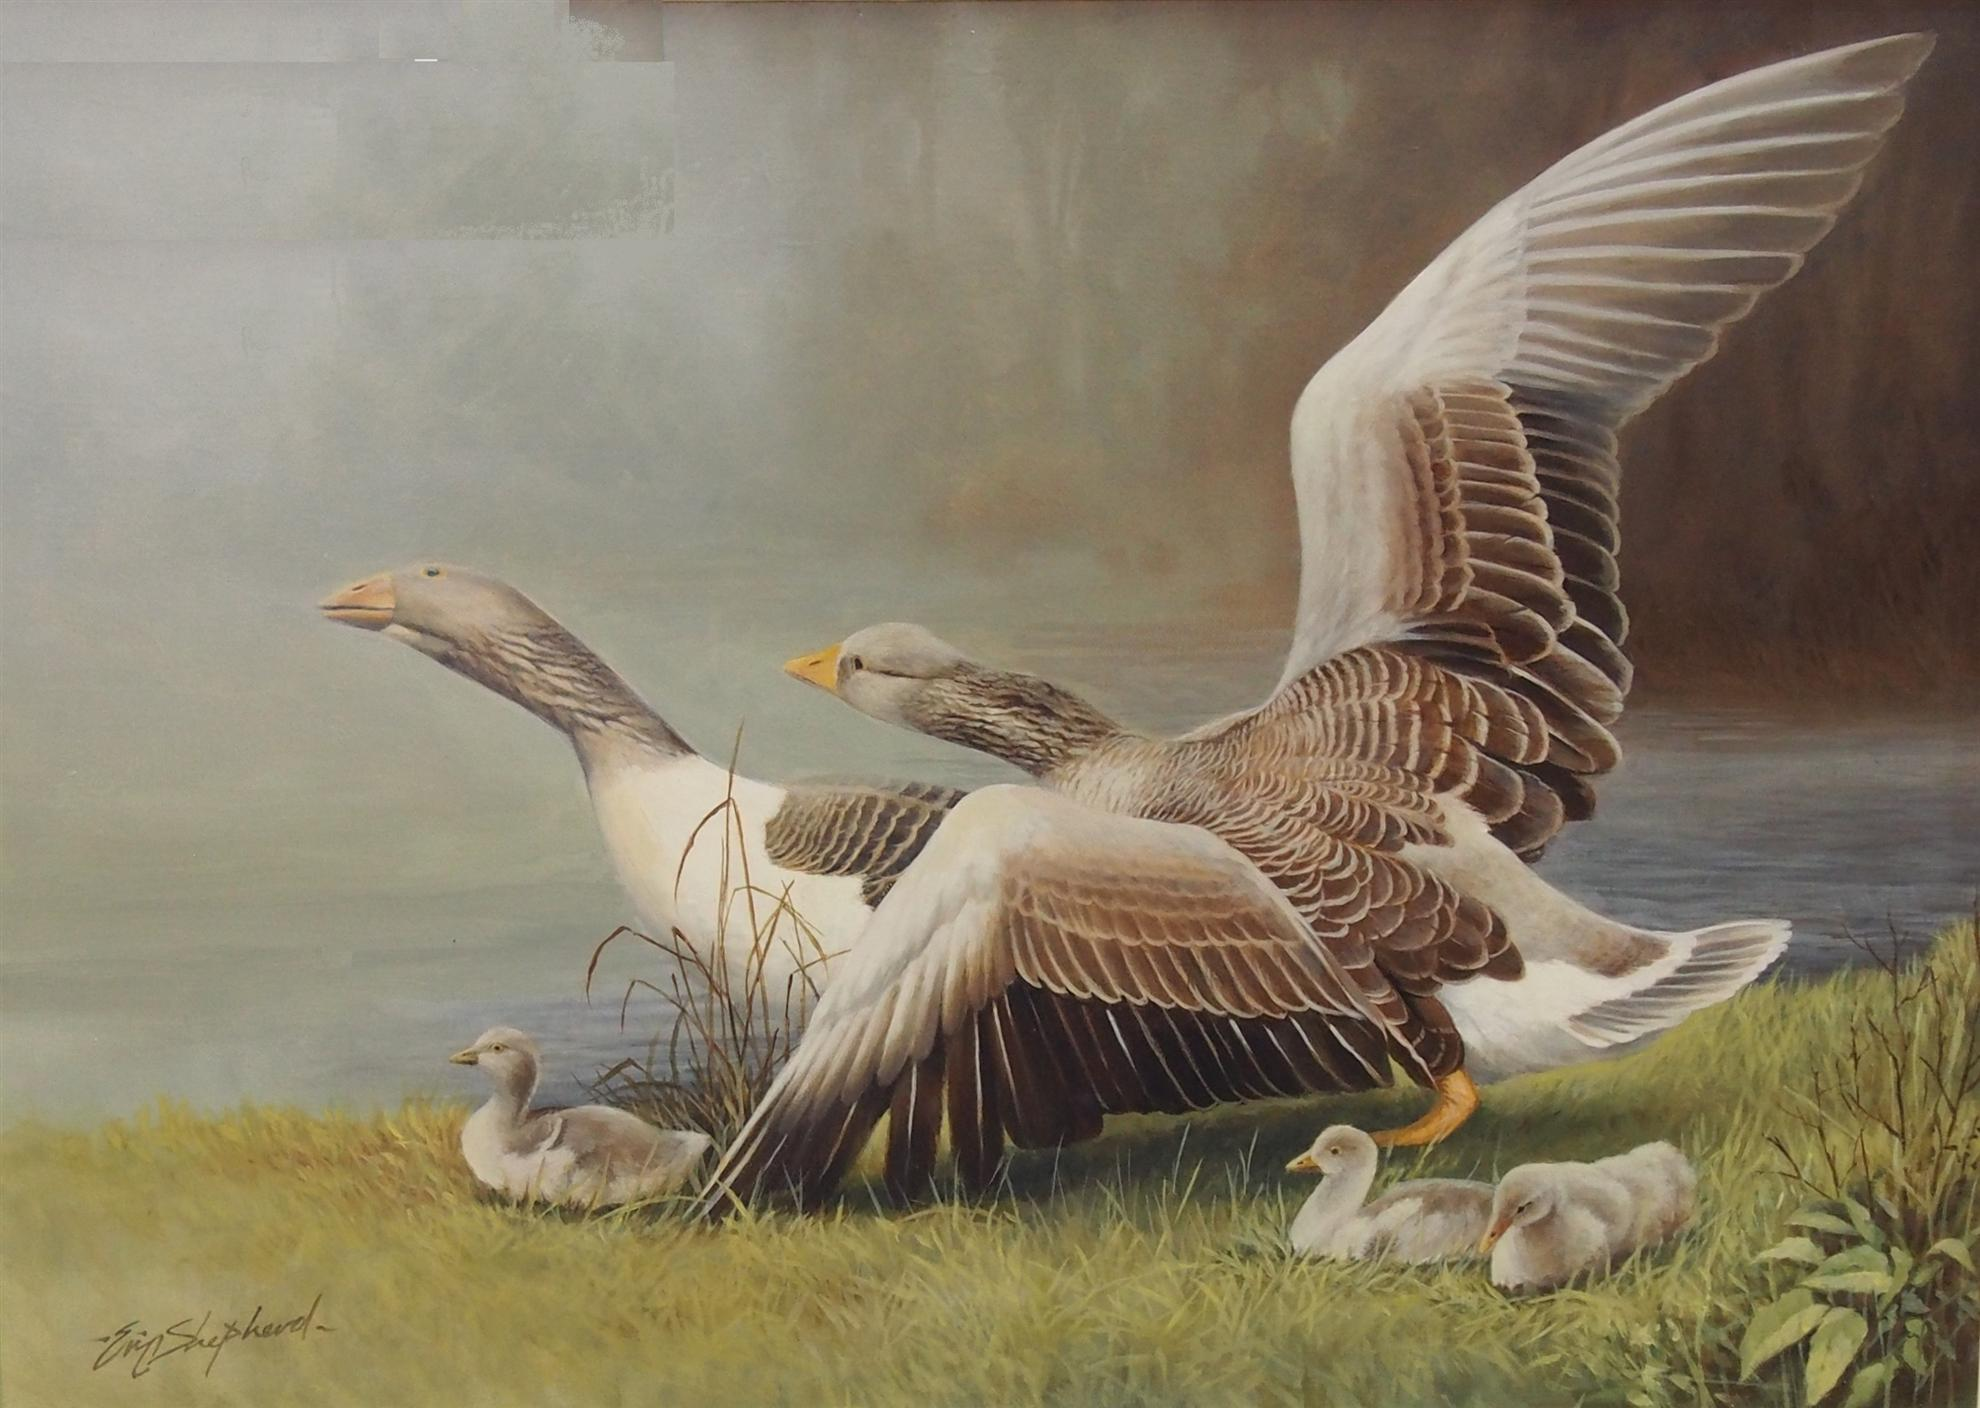 2014 Mornington Art Show - Best Oil Painting Award | Rotary Club of ...